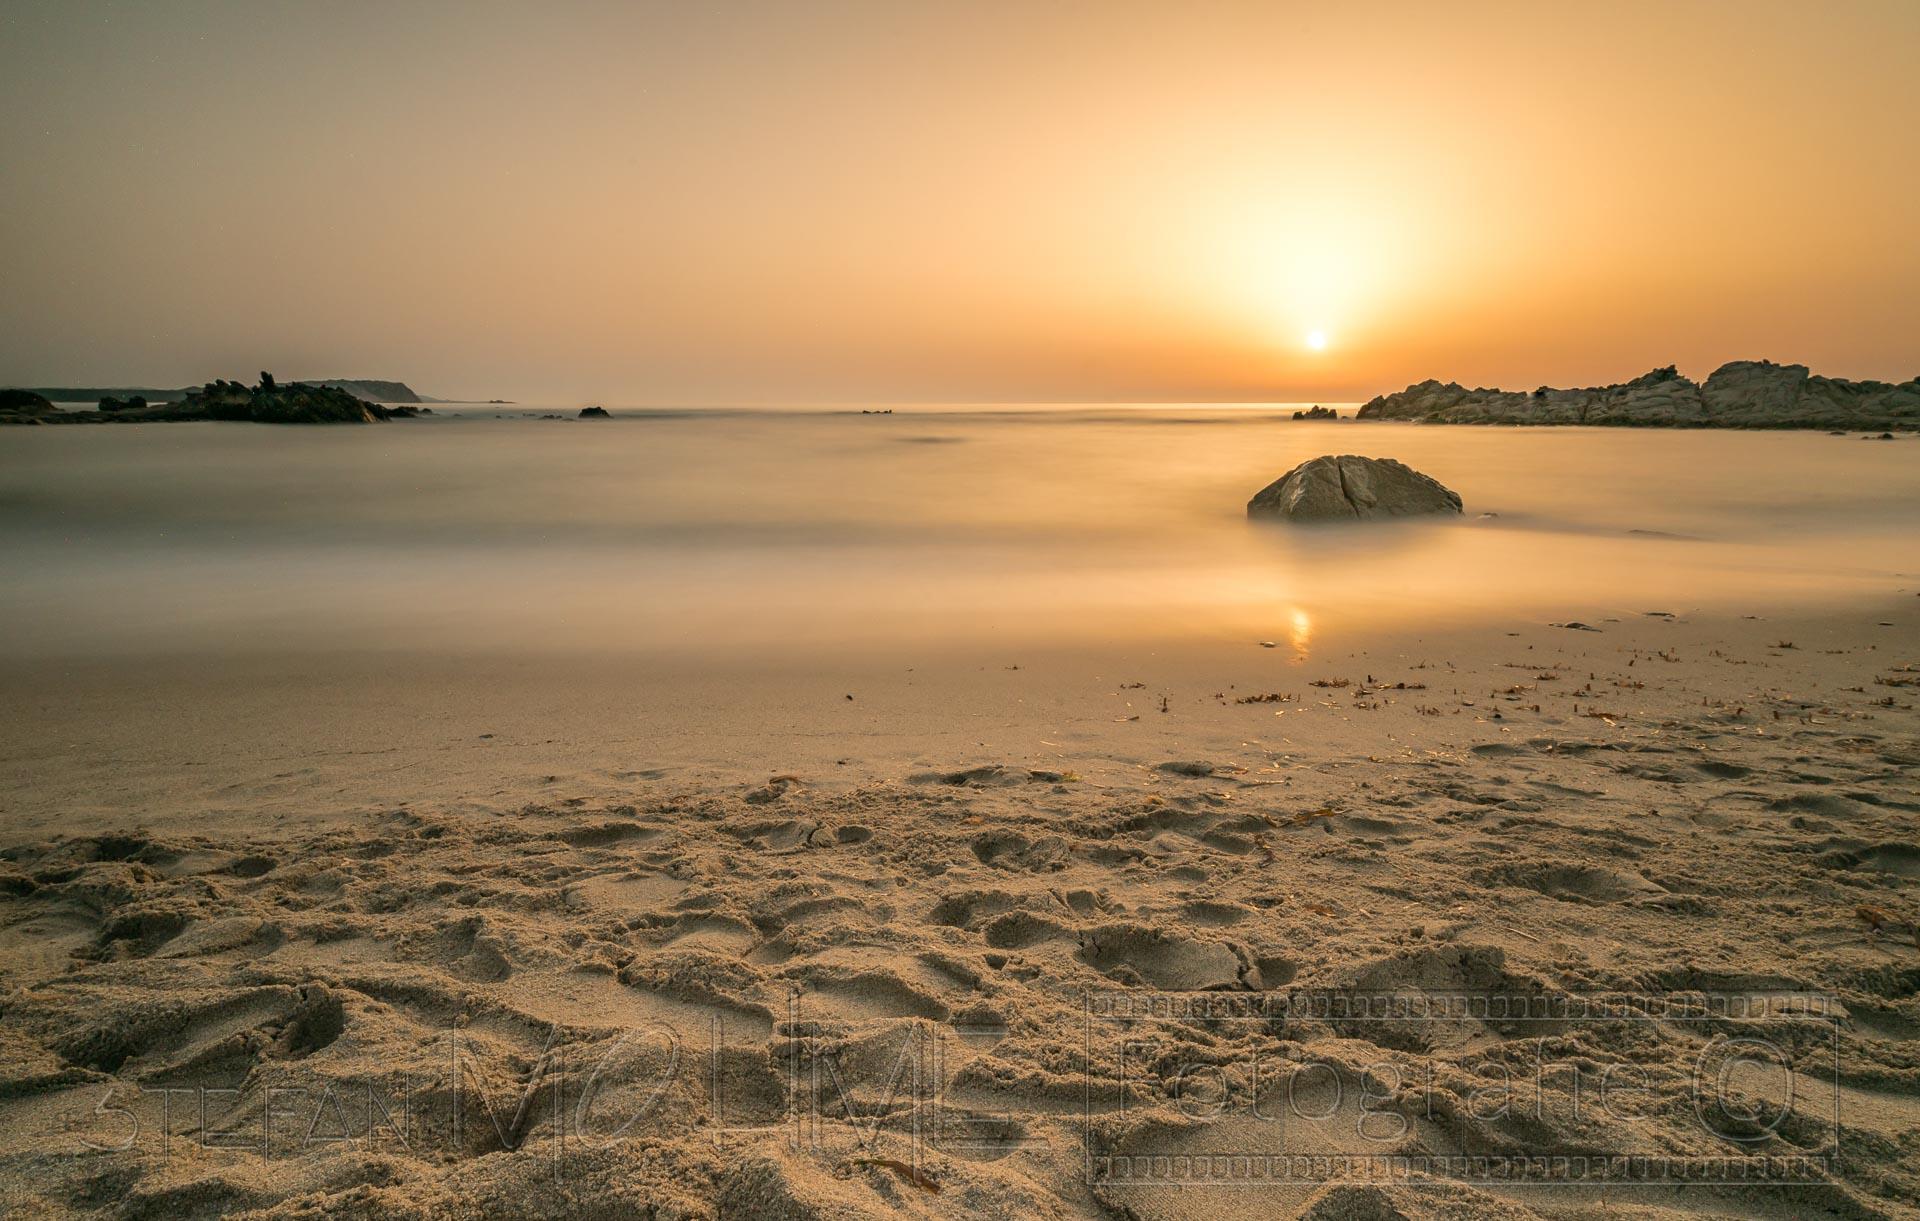 sonne,sonnenutergang,strand,meer,kueste,landschaft